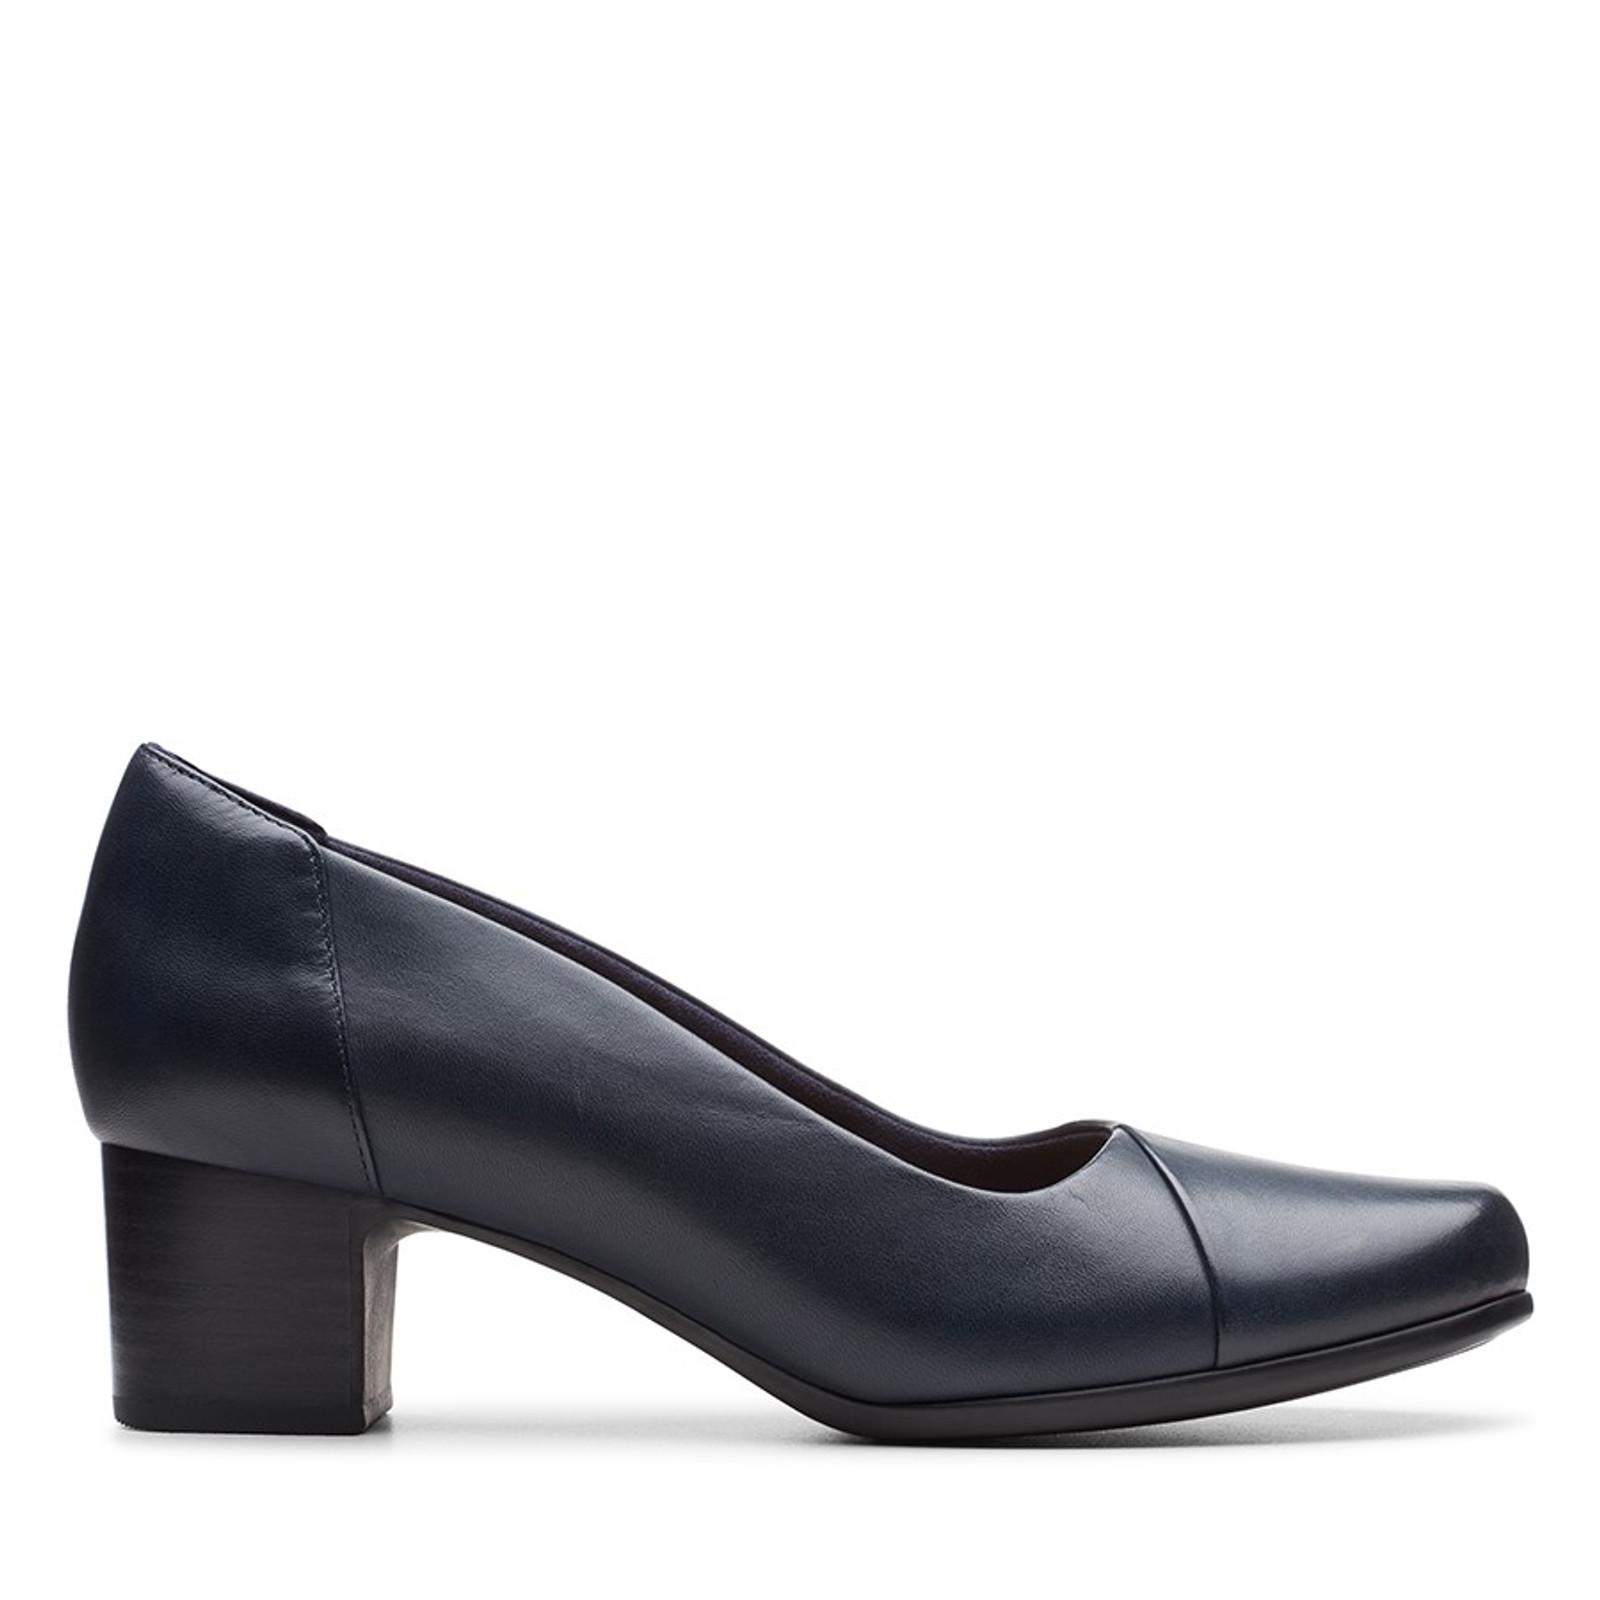 Clarks Womens UN DAMSON STEP Navy Leather